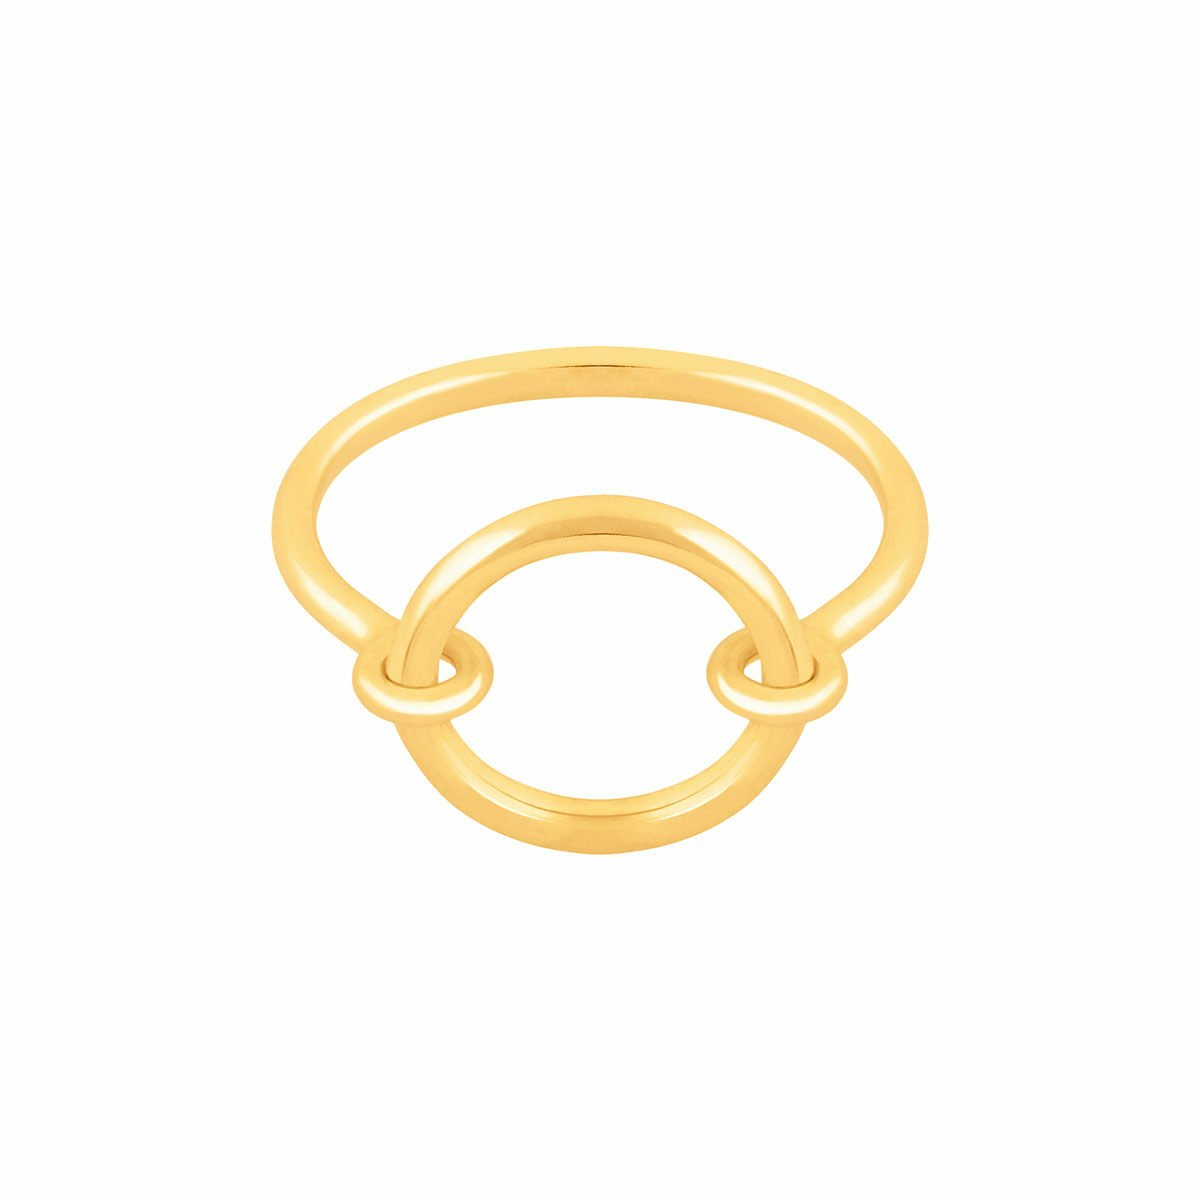 انگشتر طلا دایره متحرک